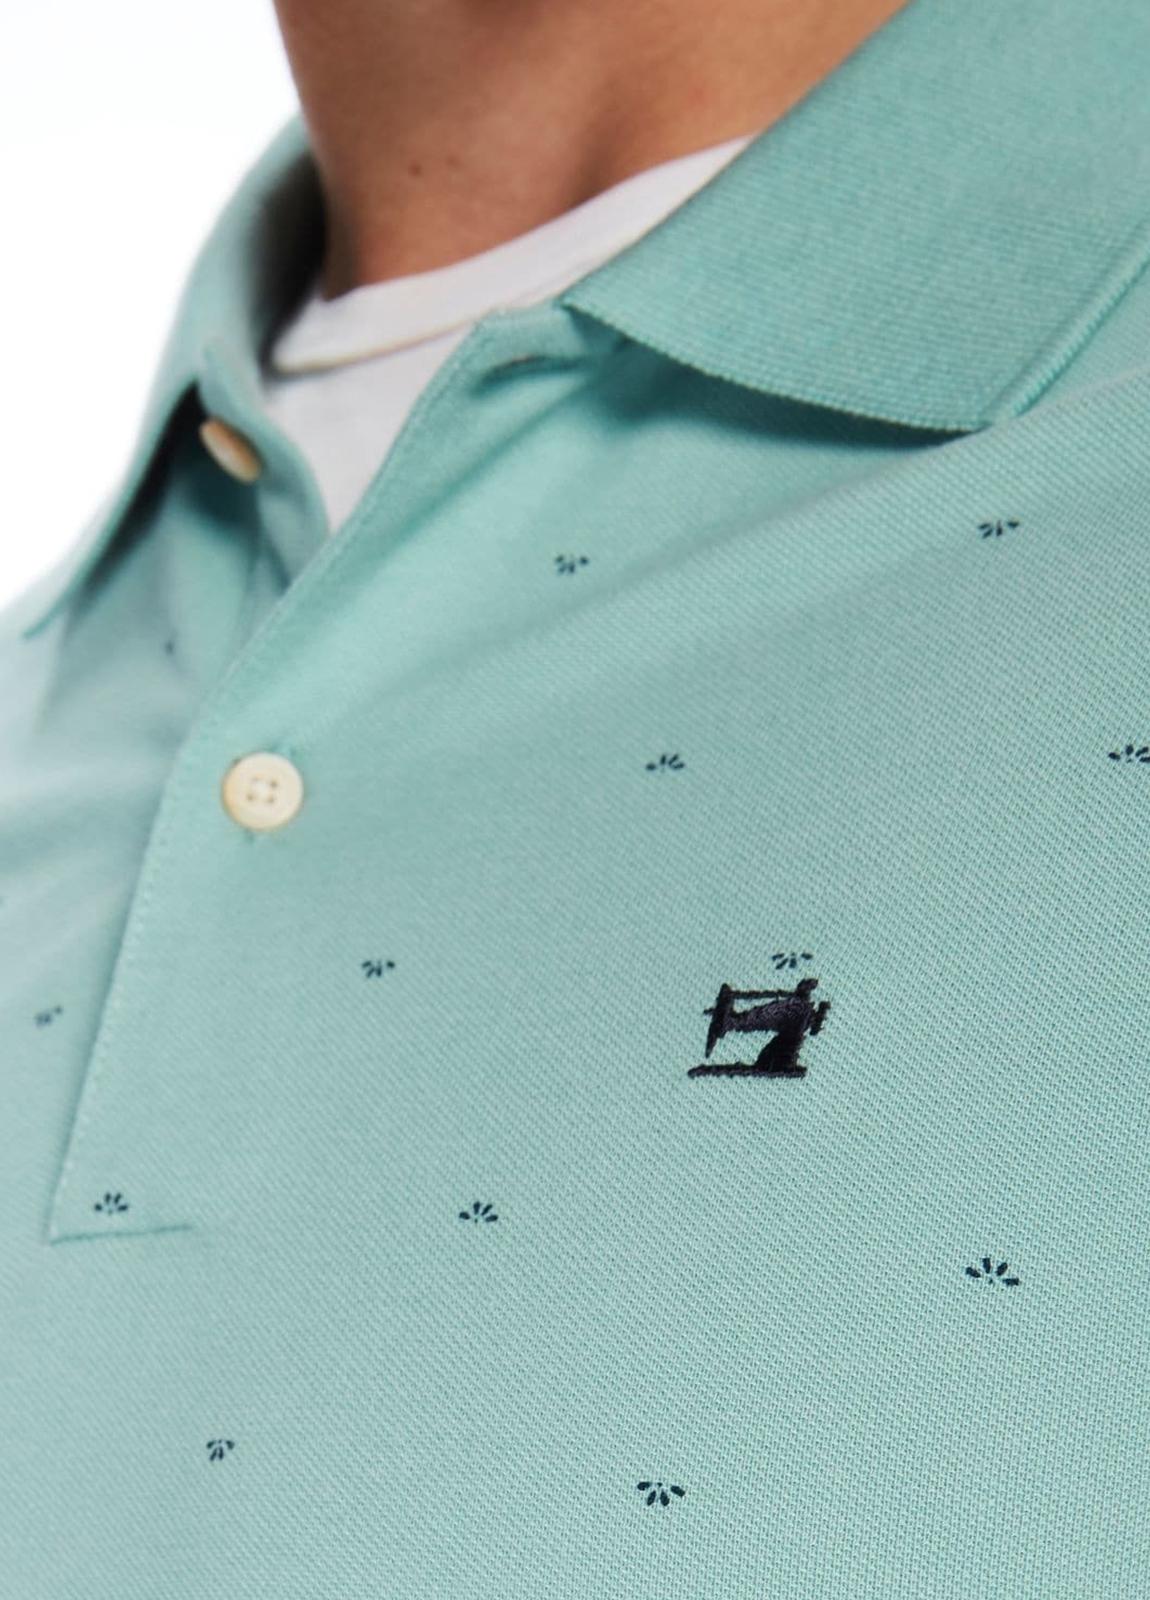 Polo manga corta de piqué color verde con motivos estampados. 100% algodón. - Ítem2